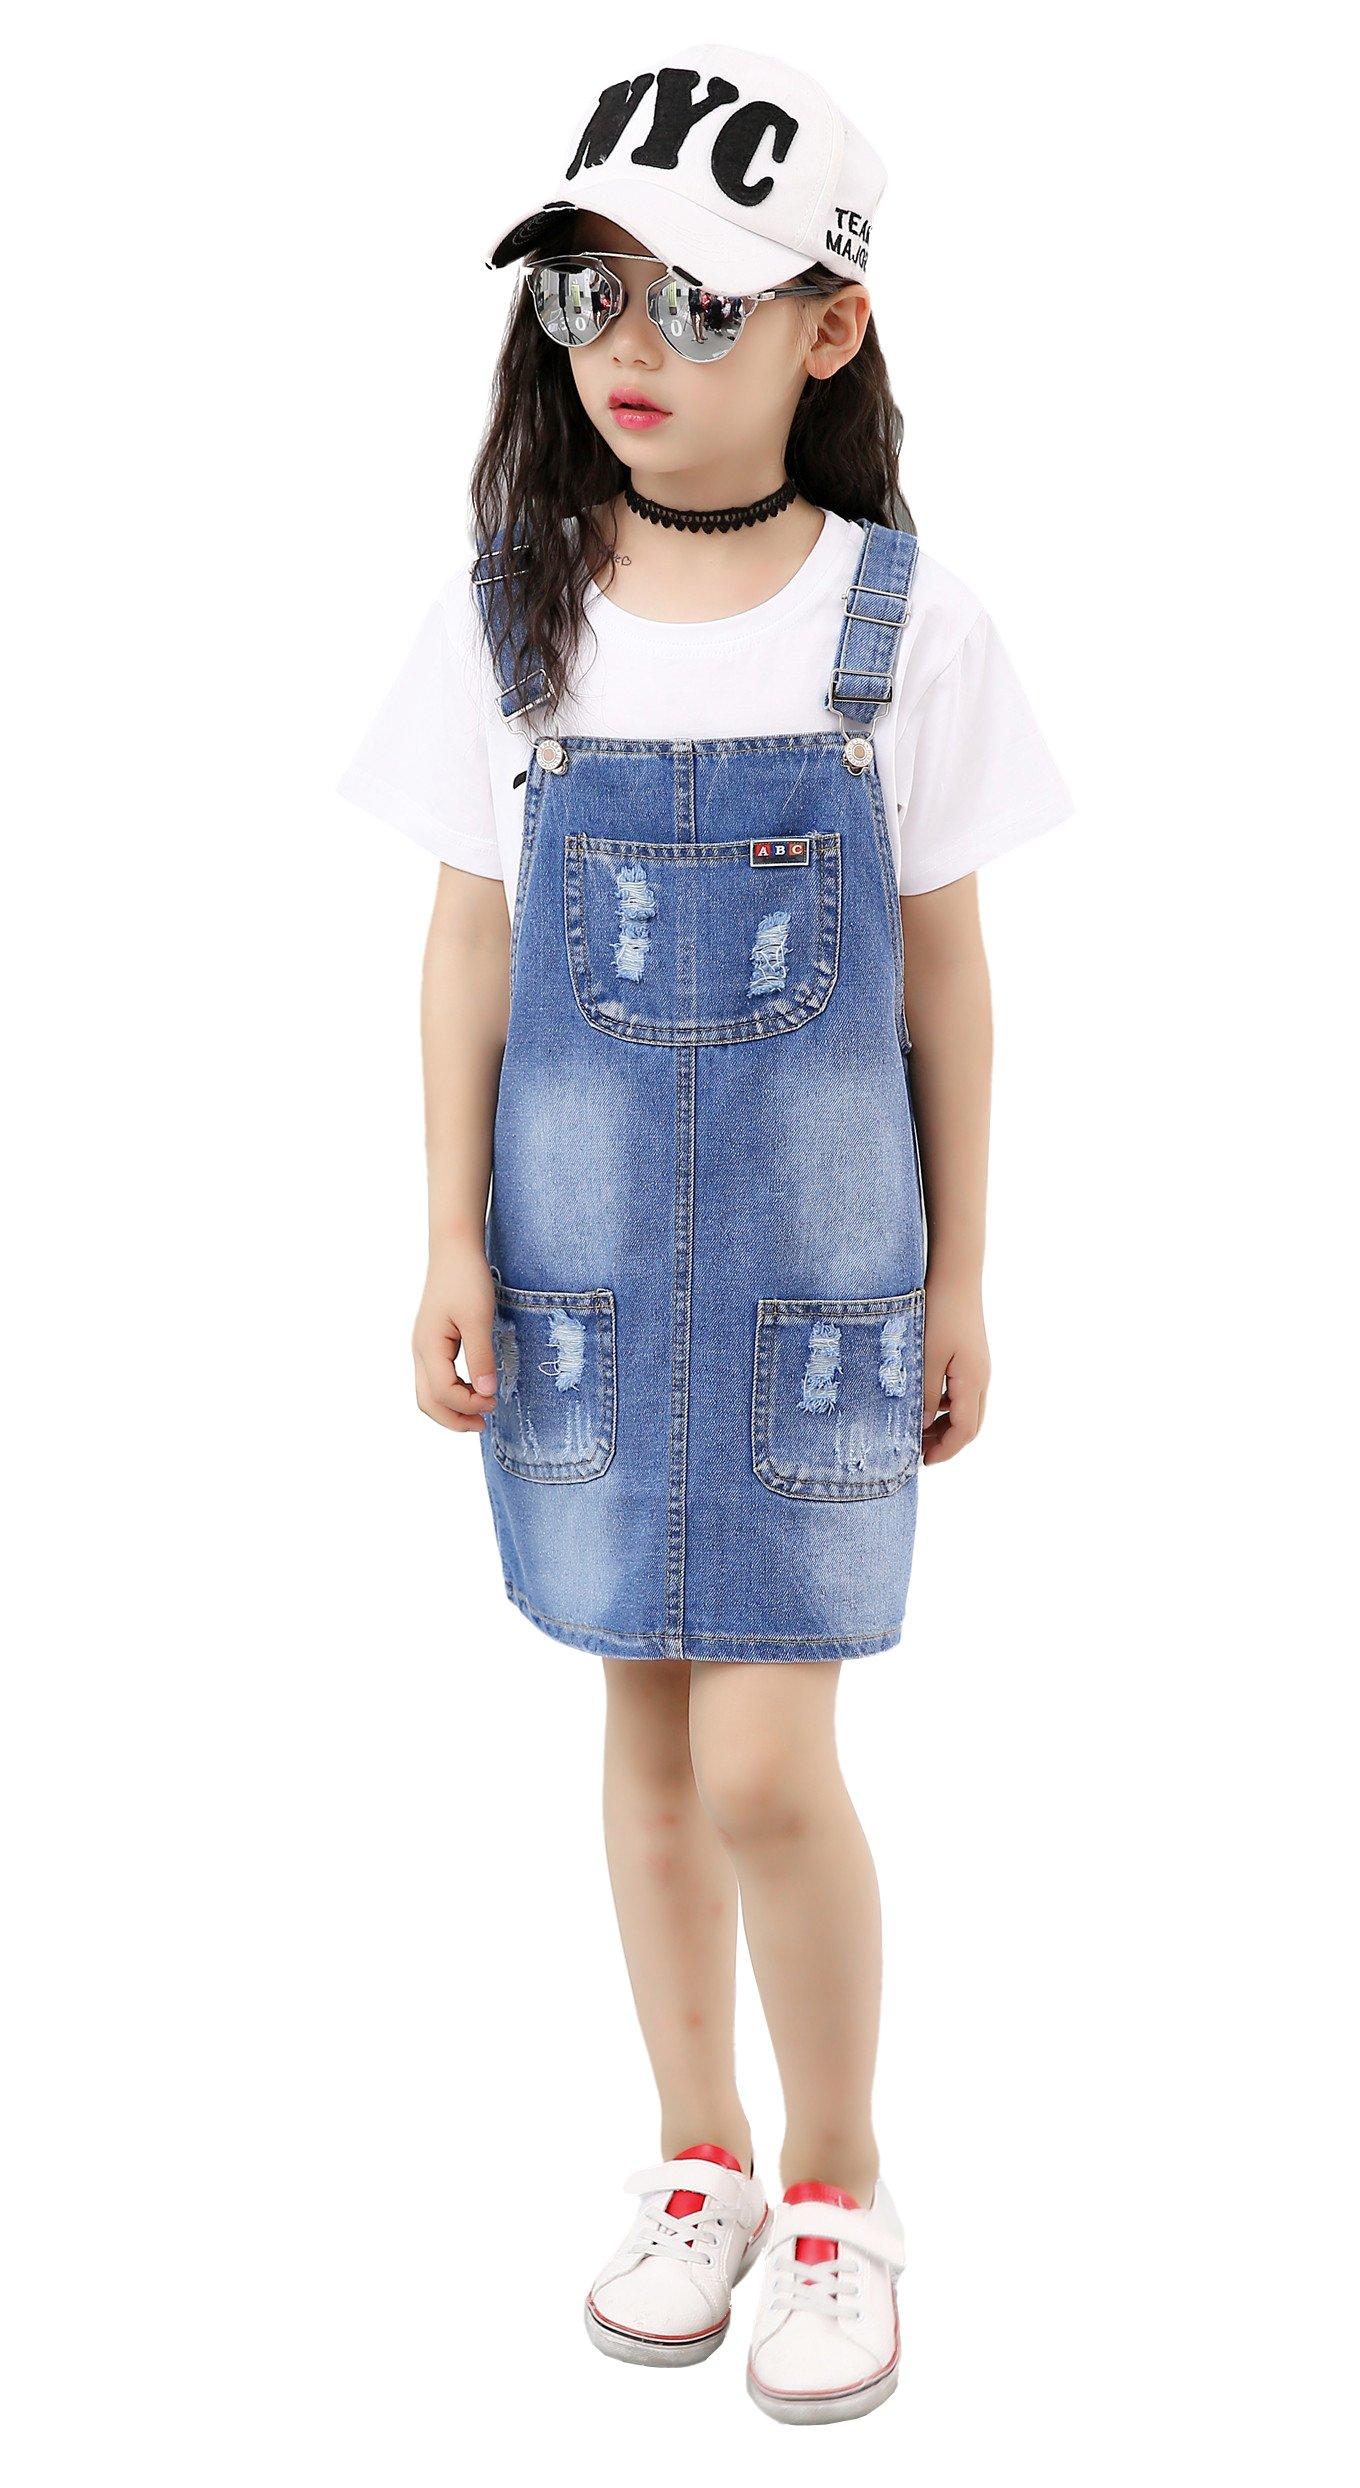 Kidscool Girls 5 Round Ripped Bibs Jeans Overalls Dress,Light Blue,6-7 Years